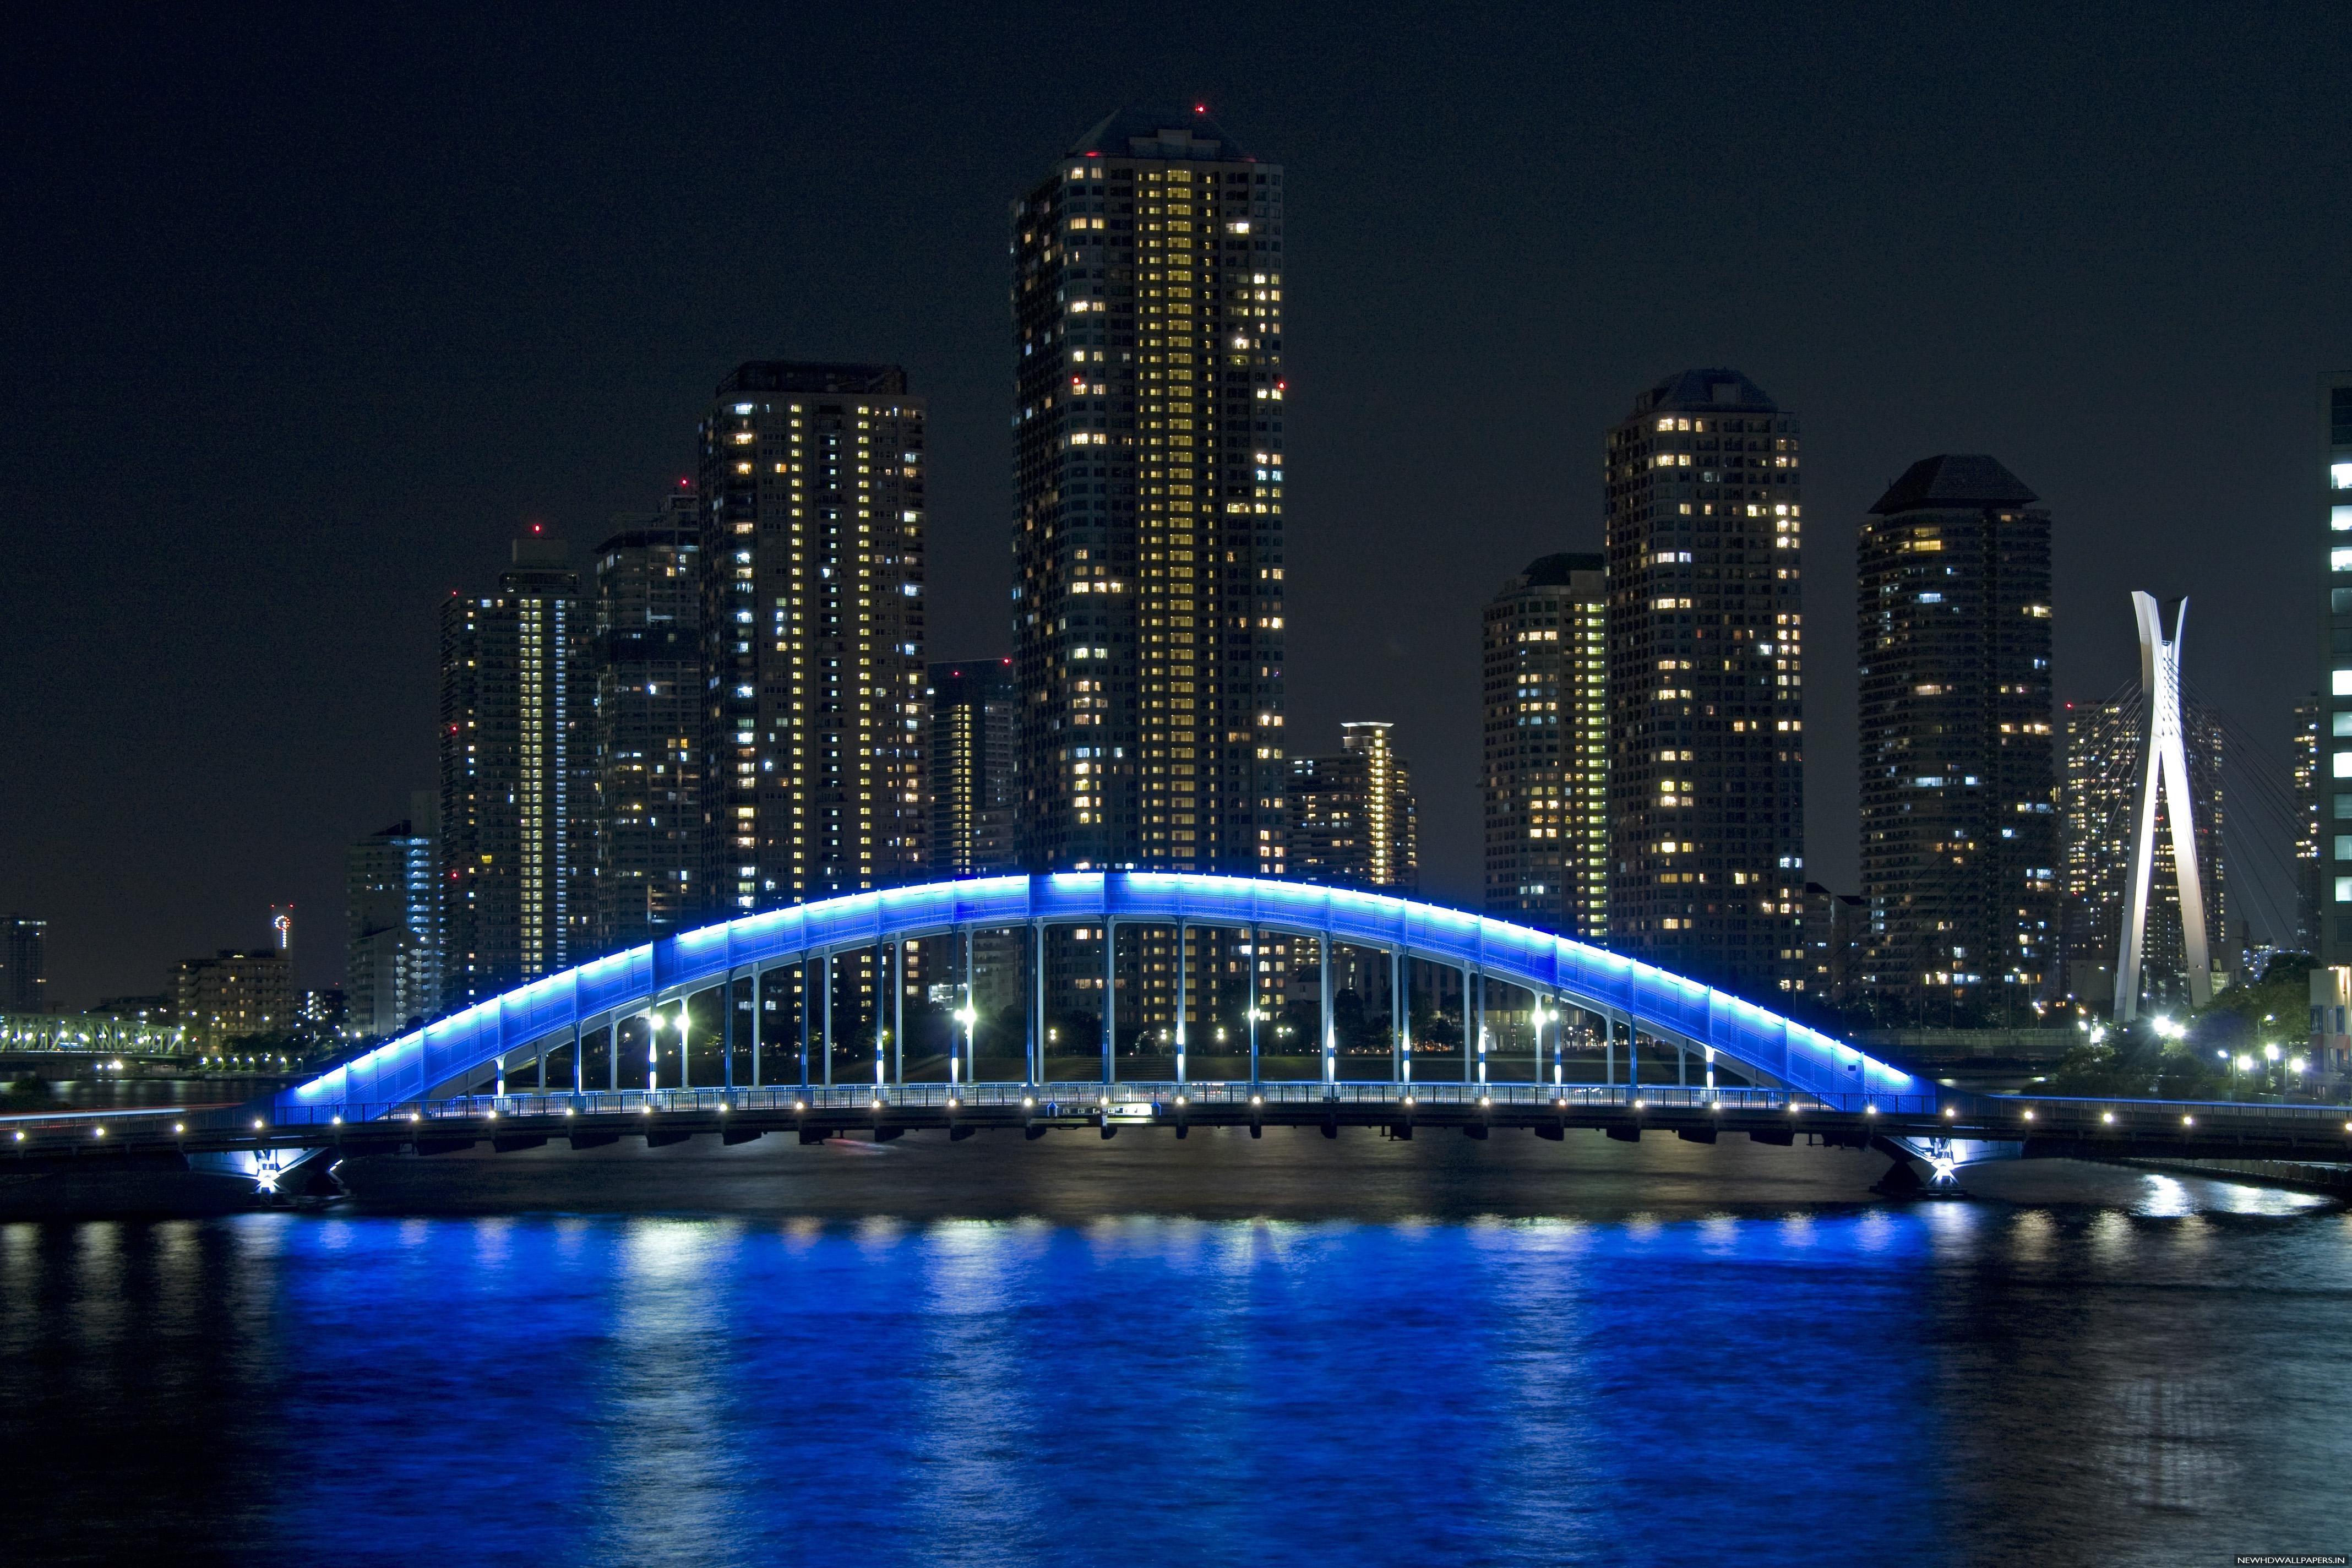 Bridge Eitai Tokyo Japan Night HD Wallpaper   New HD Wallpapers 4272x2848